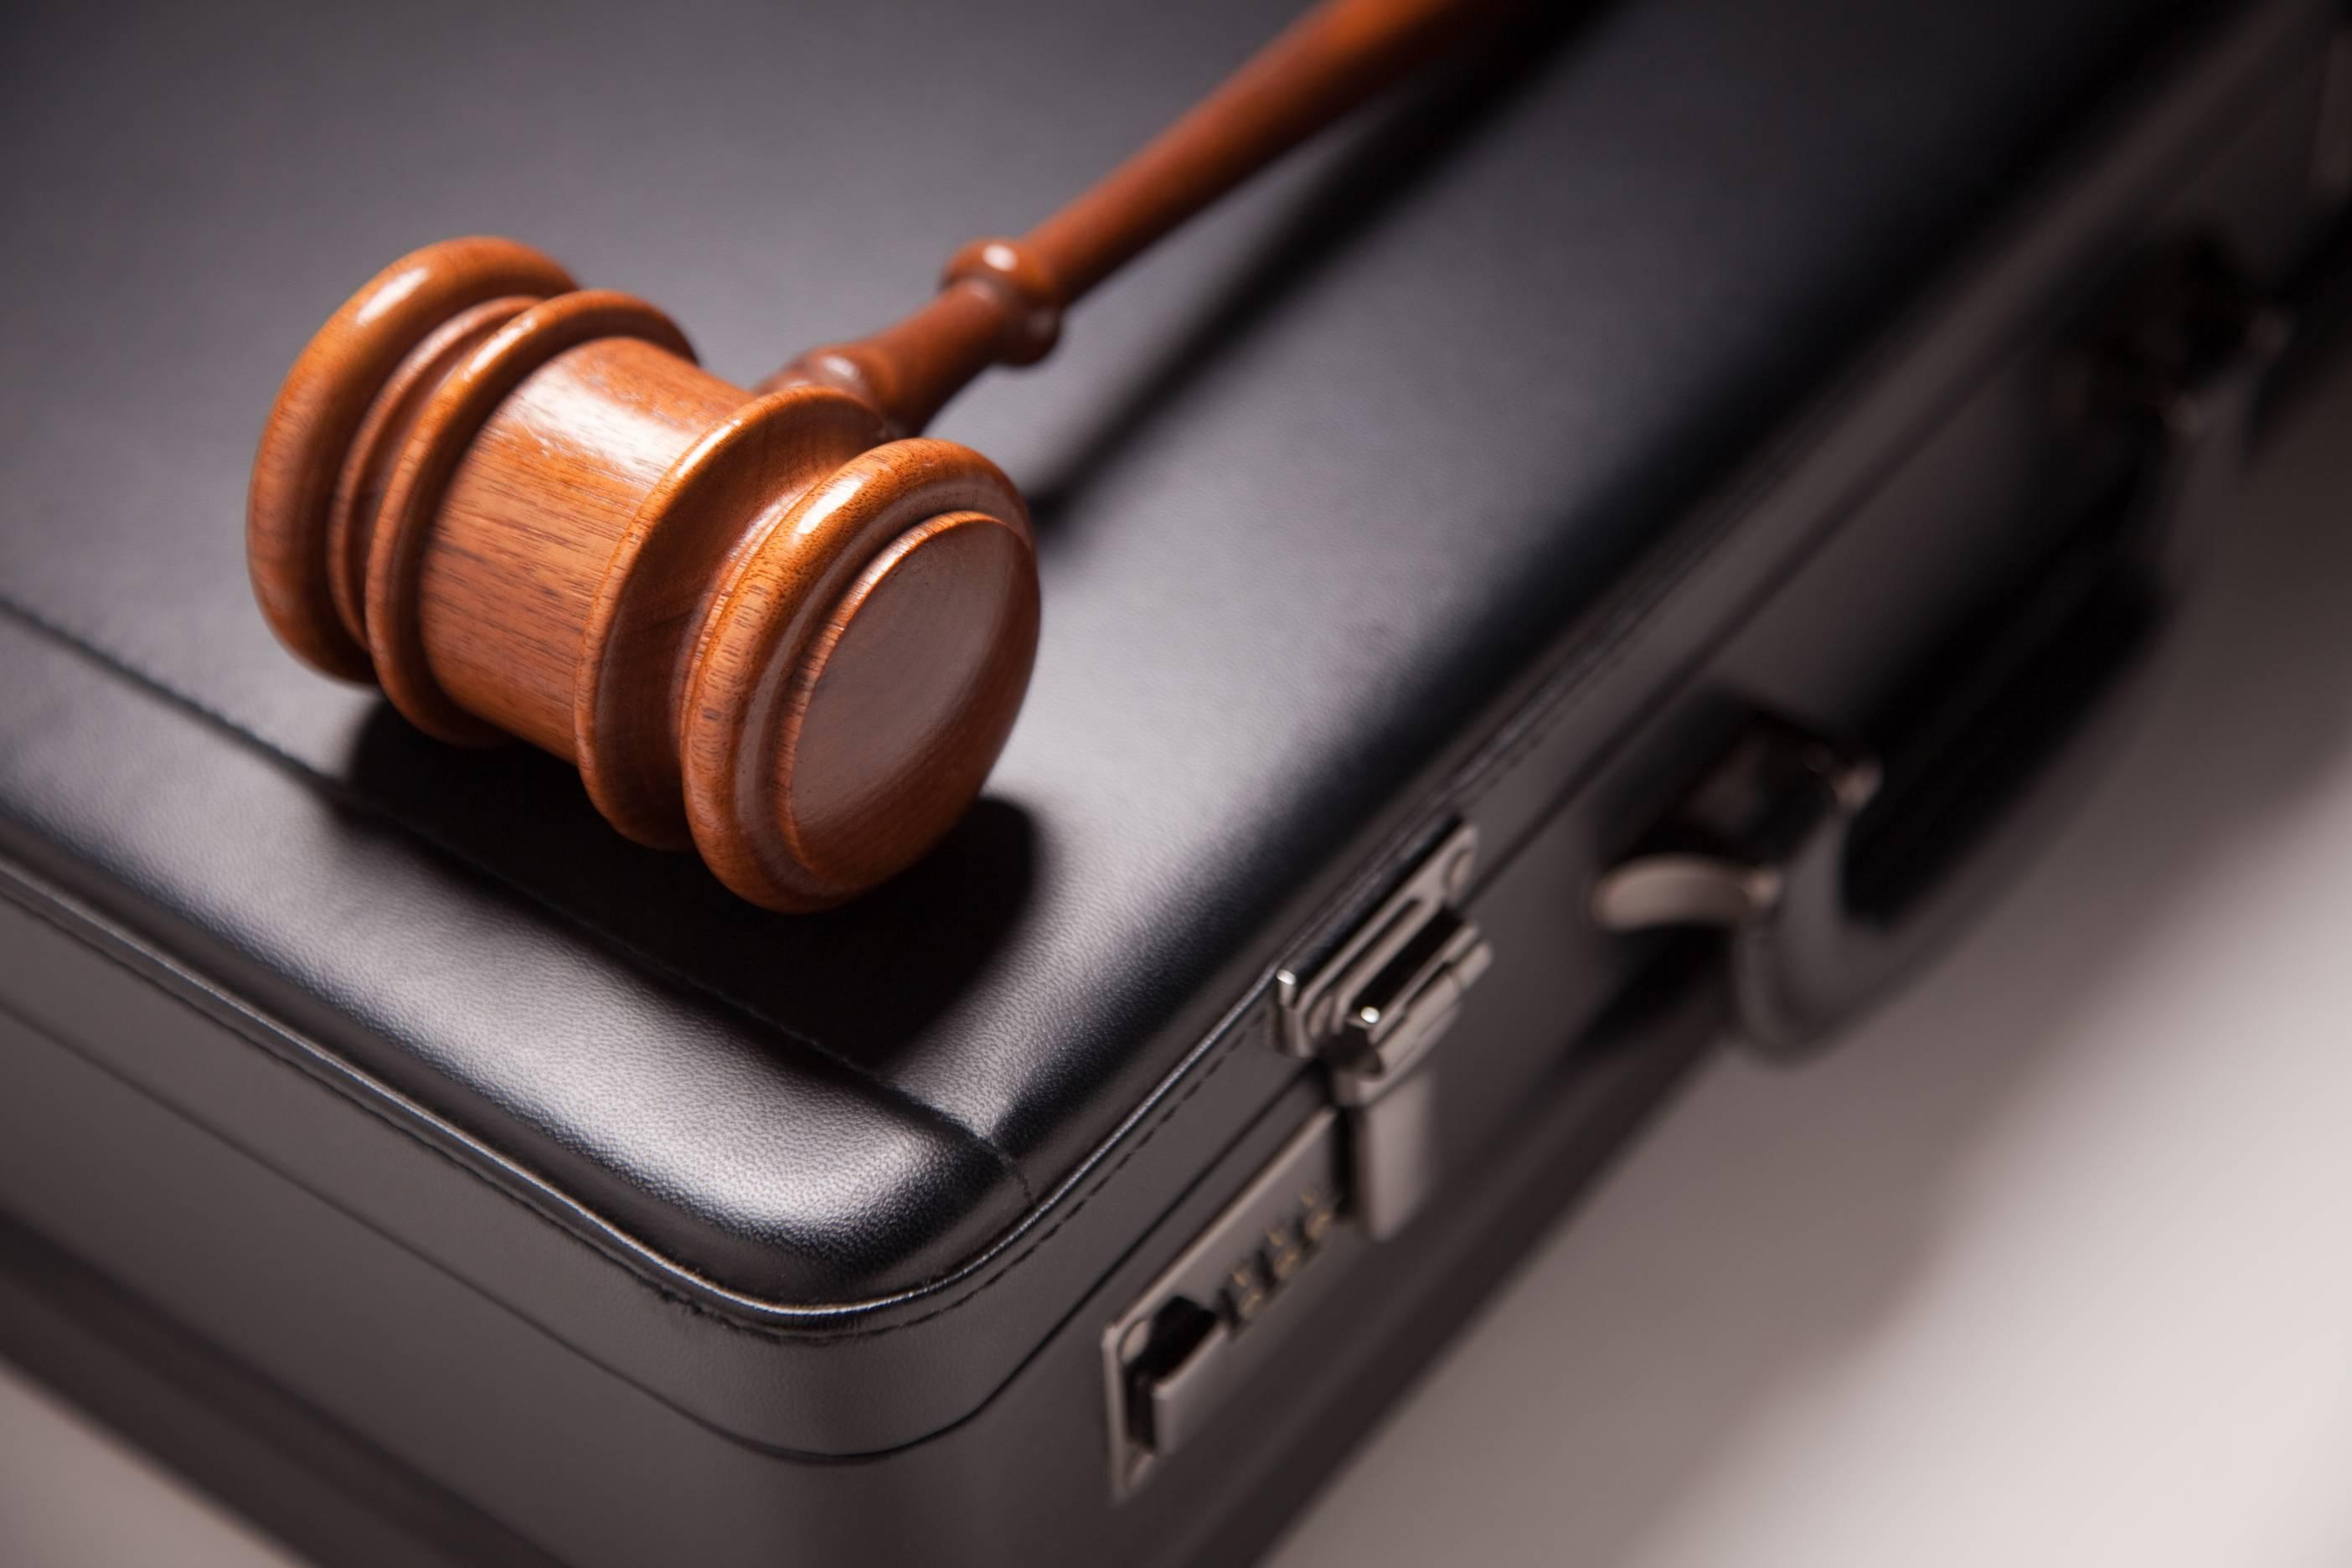 Ma tre ibrahima gueye cabinet d 39 avocats d 39 affaires afrique arbitrage - Cabinet d avocats d affaires ...